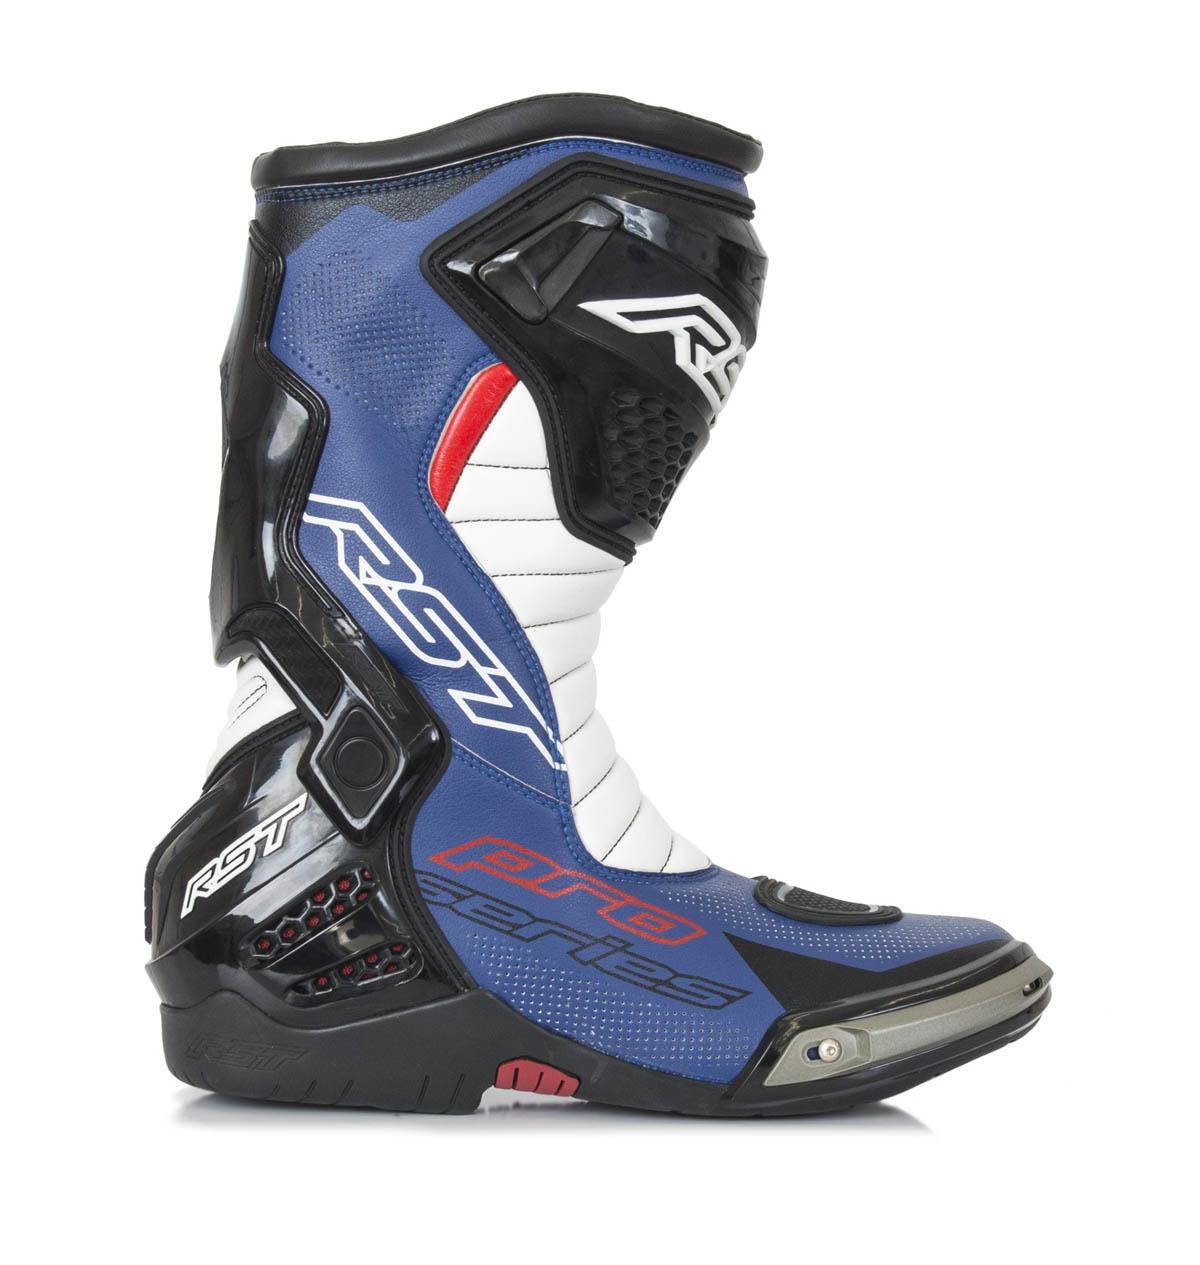 【RST】RST PRO SERIES 1503 RACE CE 車靴 - 「Webike-摩托百貨」